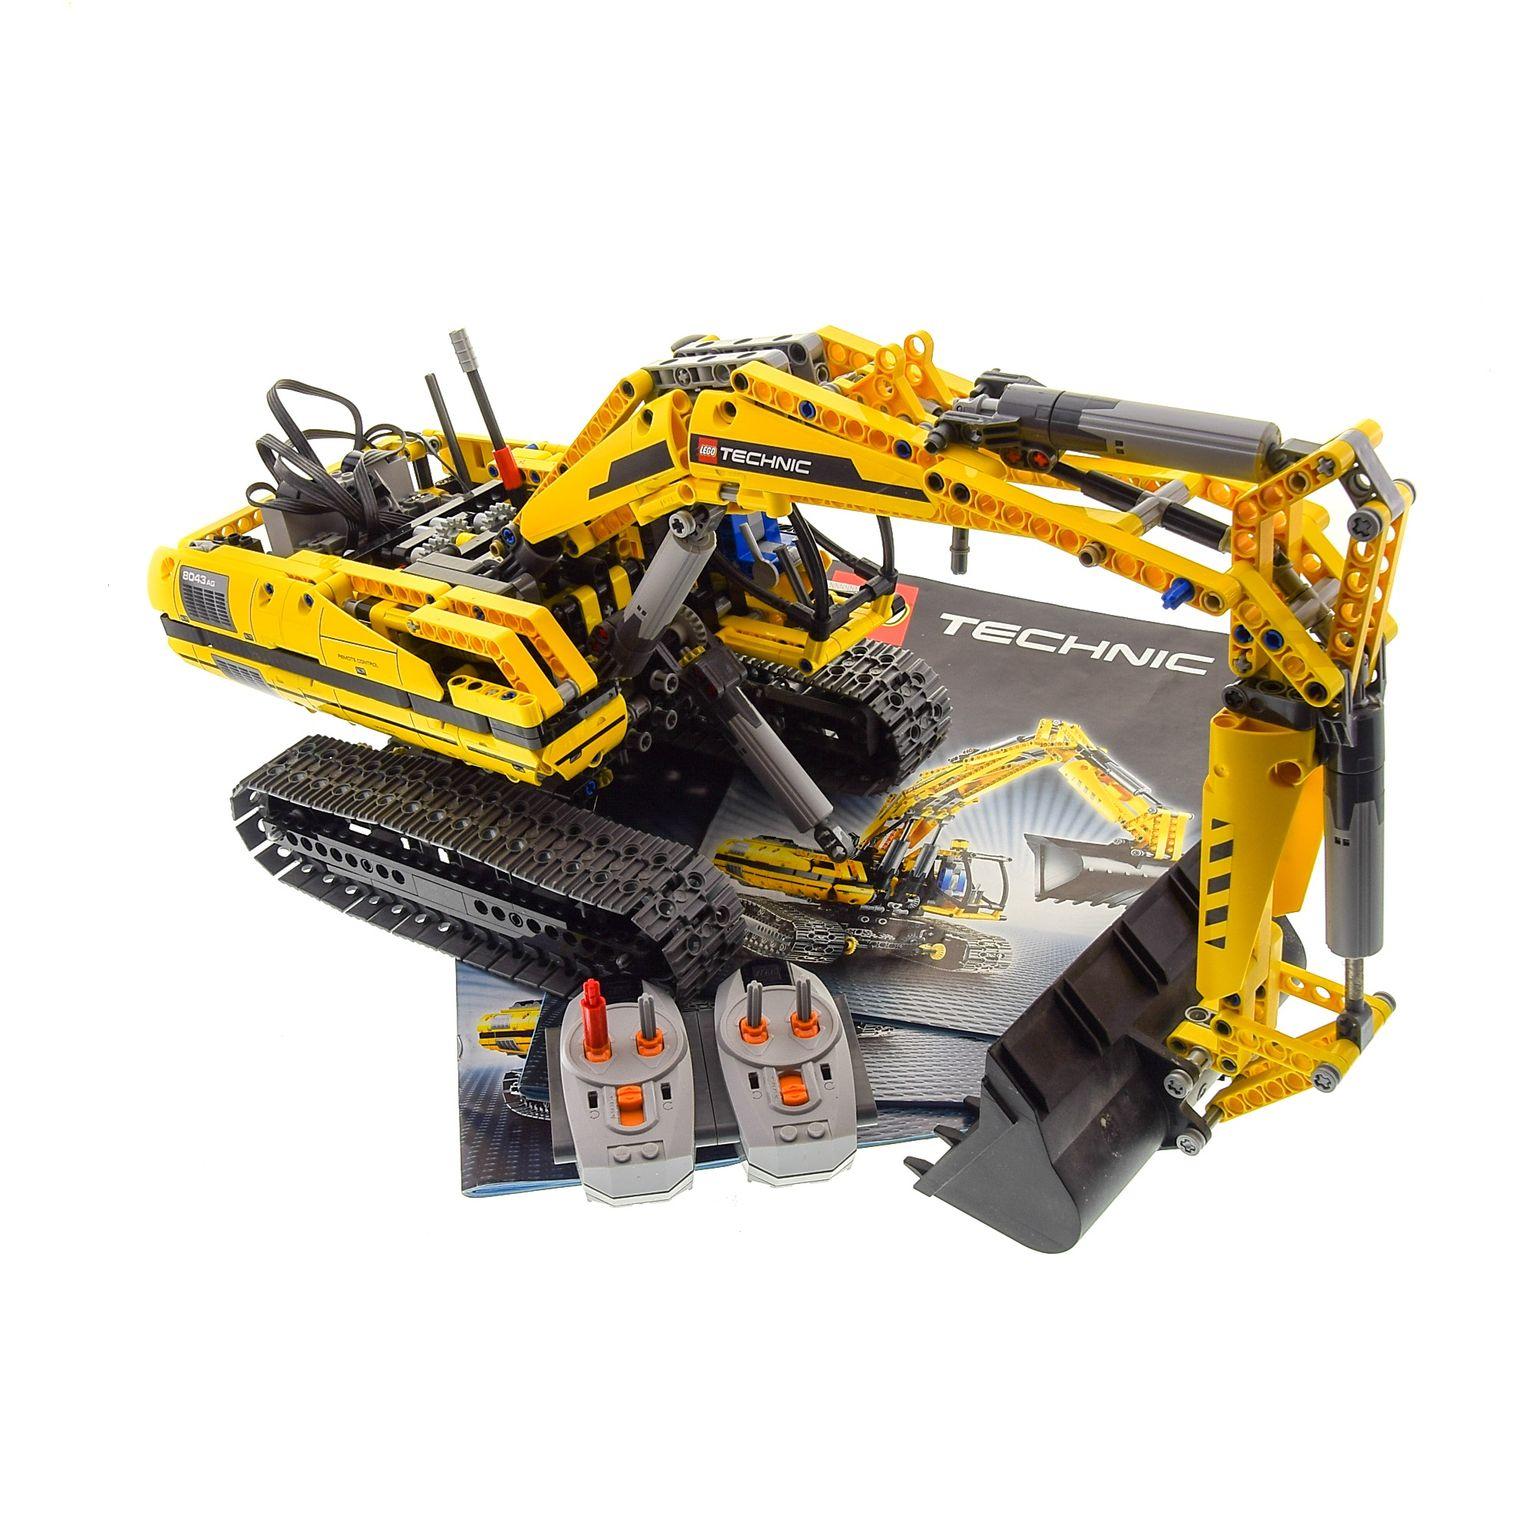 1 X Lego Technic Teile Set Modell Construction 8043 Raupen Bagger